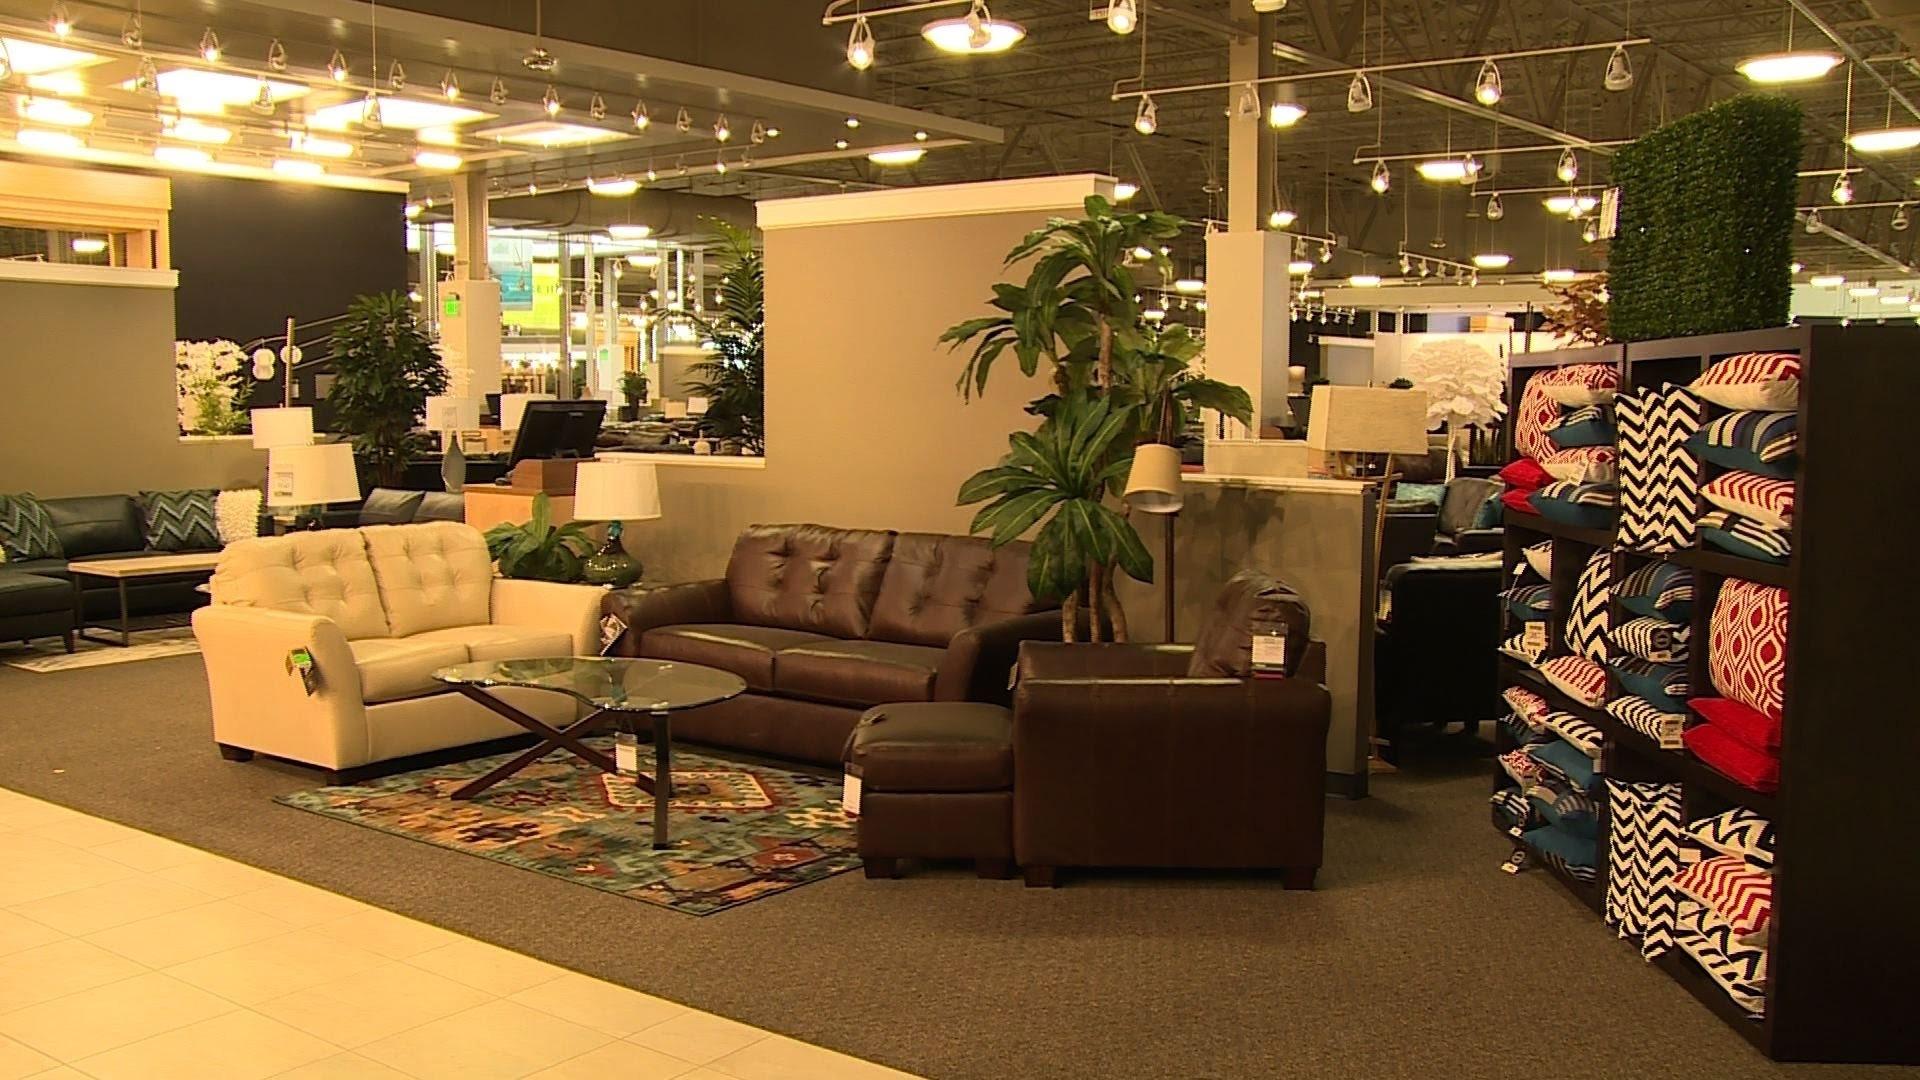 Luxury Sectional Sofa Nebraska Furniture Mart – Buildsimplehome Pertaining To Nebraska Furniture Mart Sectional Sofas (View 9 of 10)